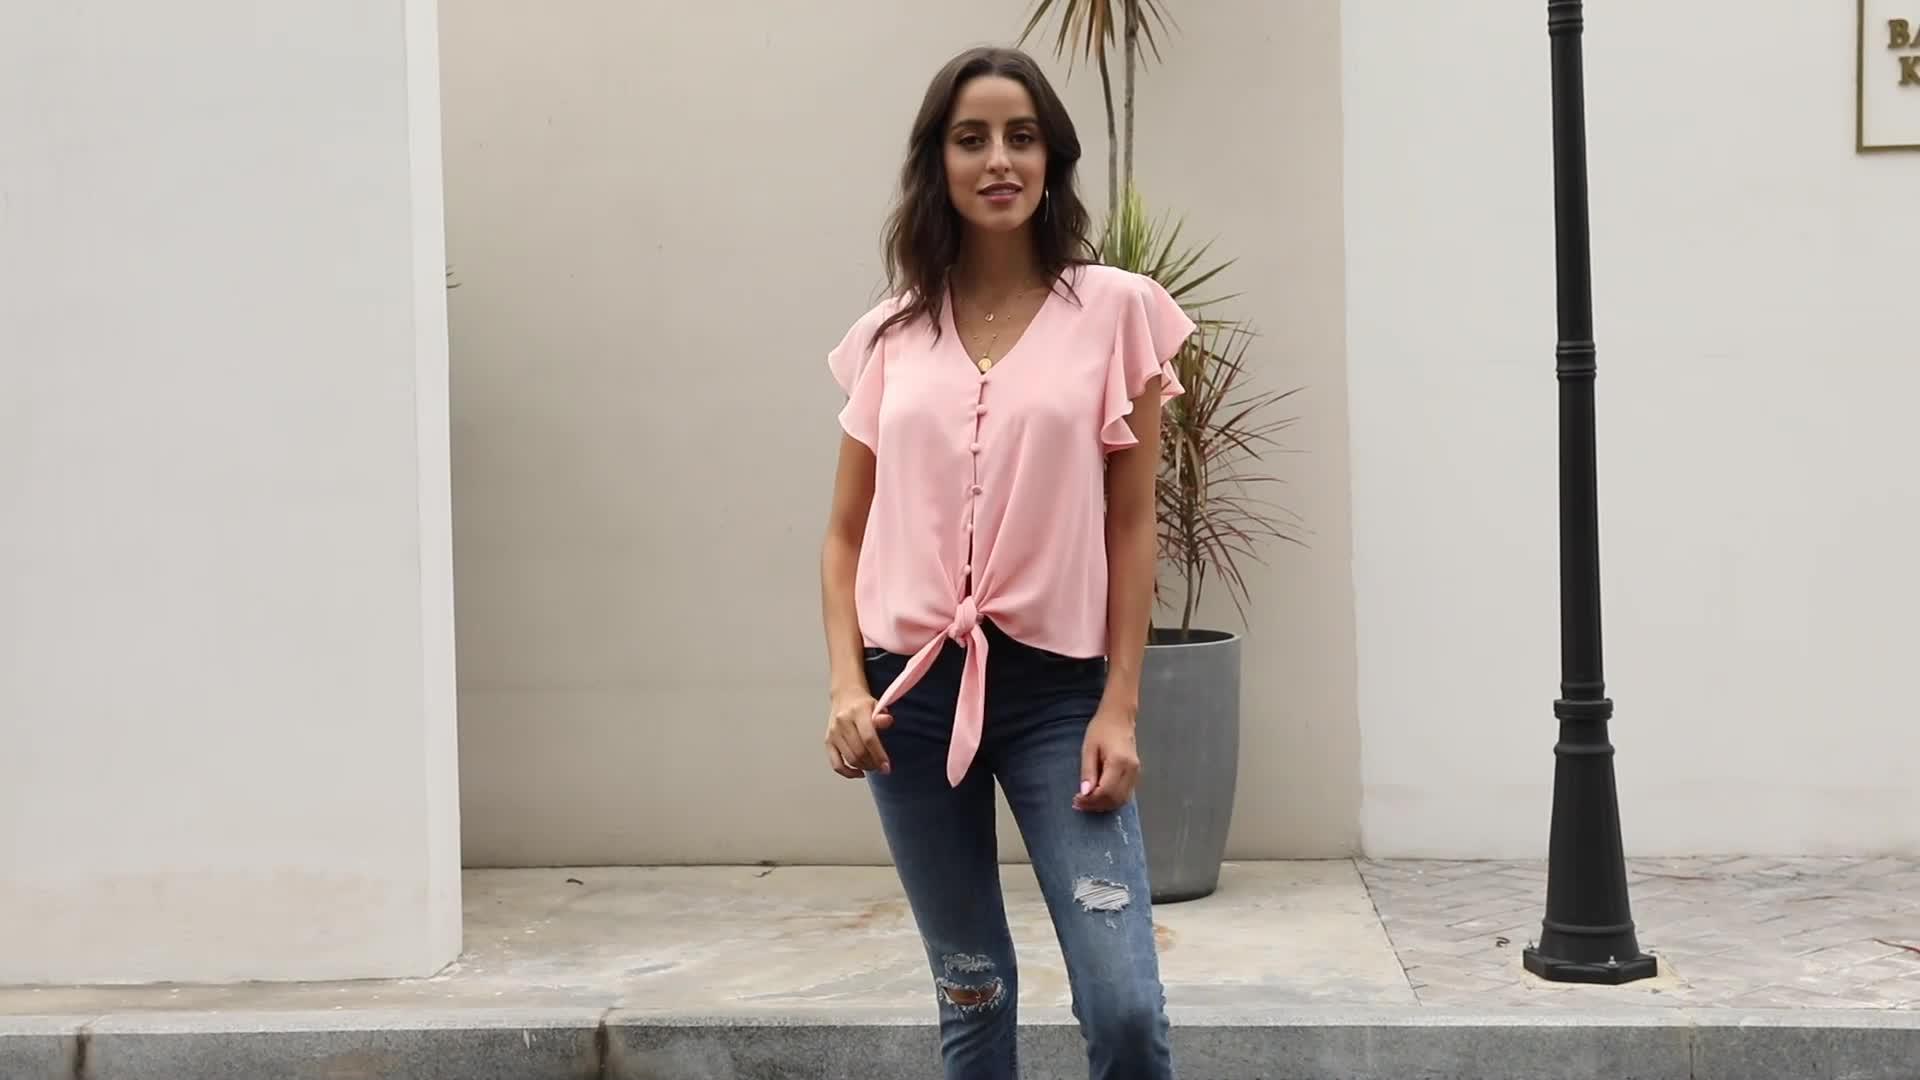 Nieuwste ontwerp casual womens kleding zomer losse tops blouse